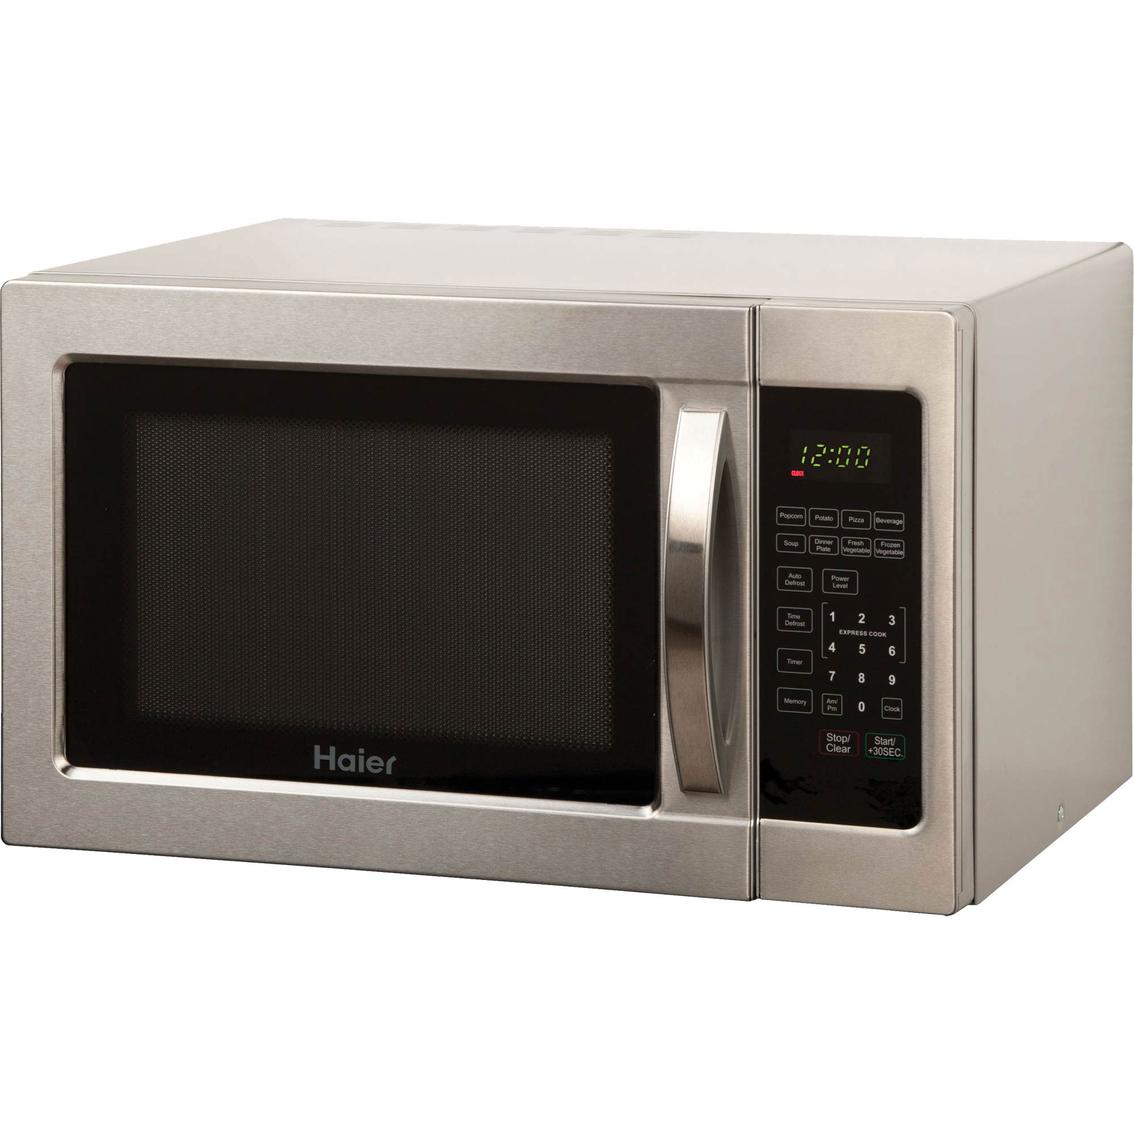 Haier 1.0 Cu. Ft. Microwave Countertop Microwaves Home ...